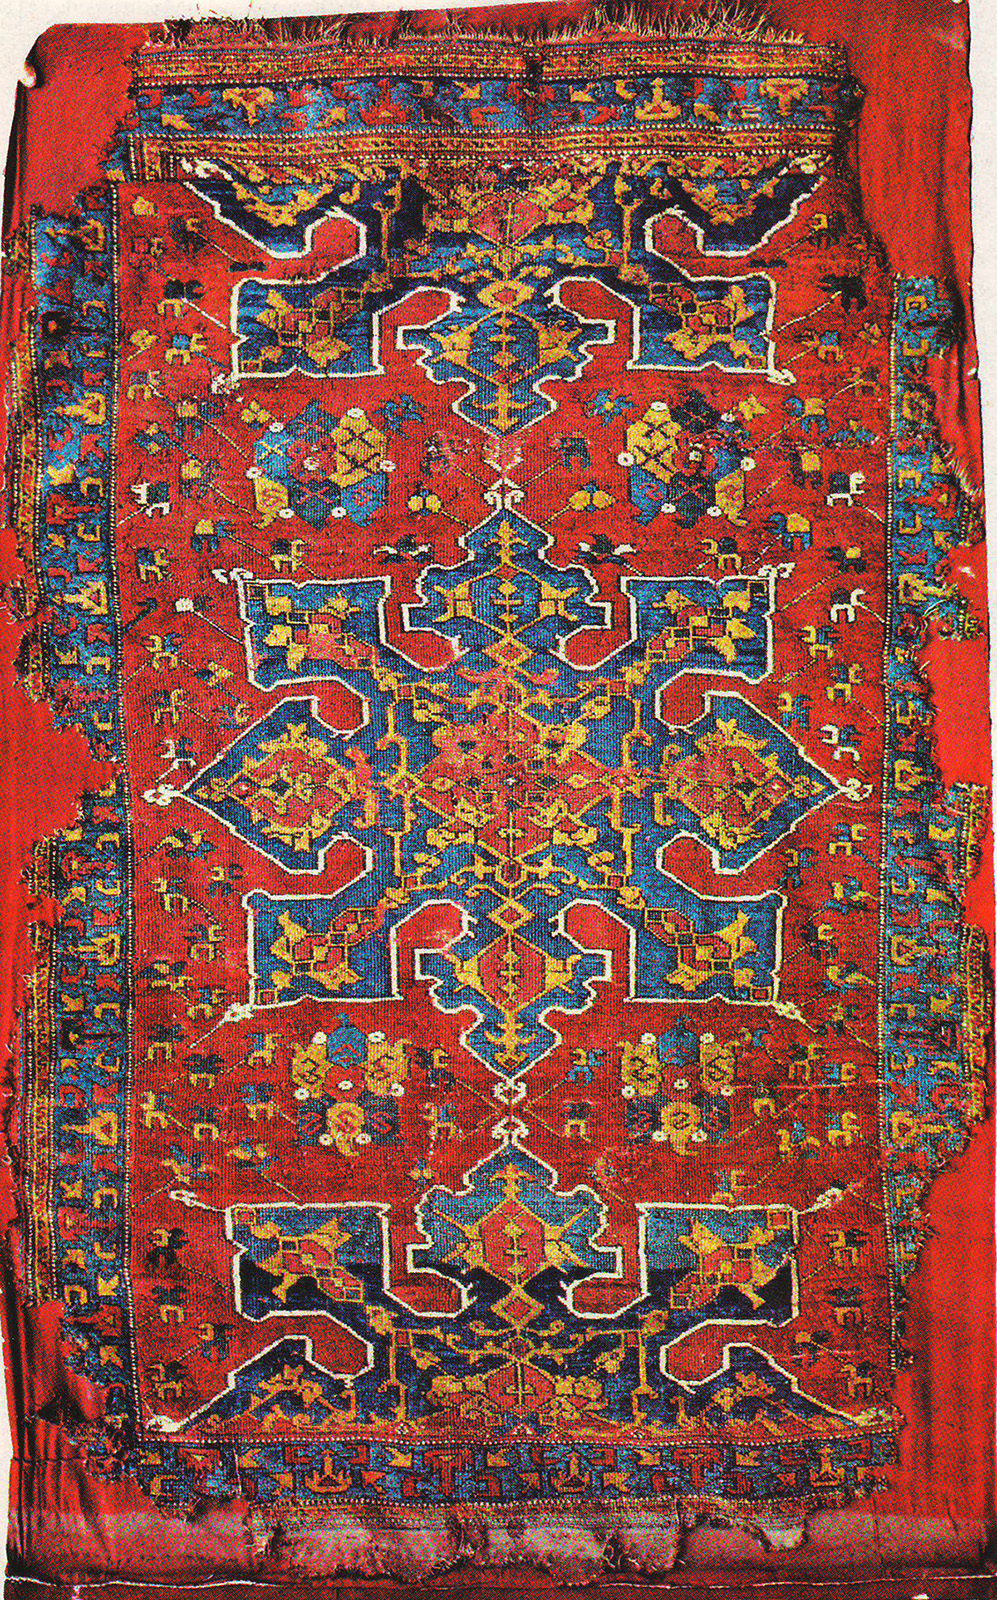 Star Ushak Rug Xvii 17 Century Turkey Ottoman Empire